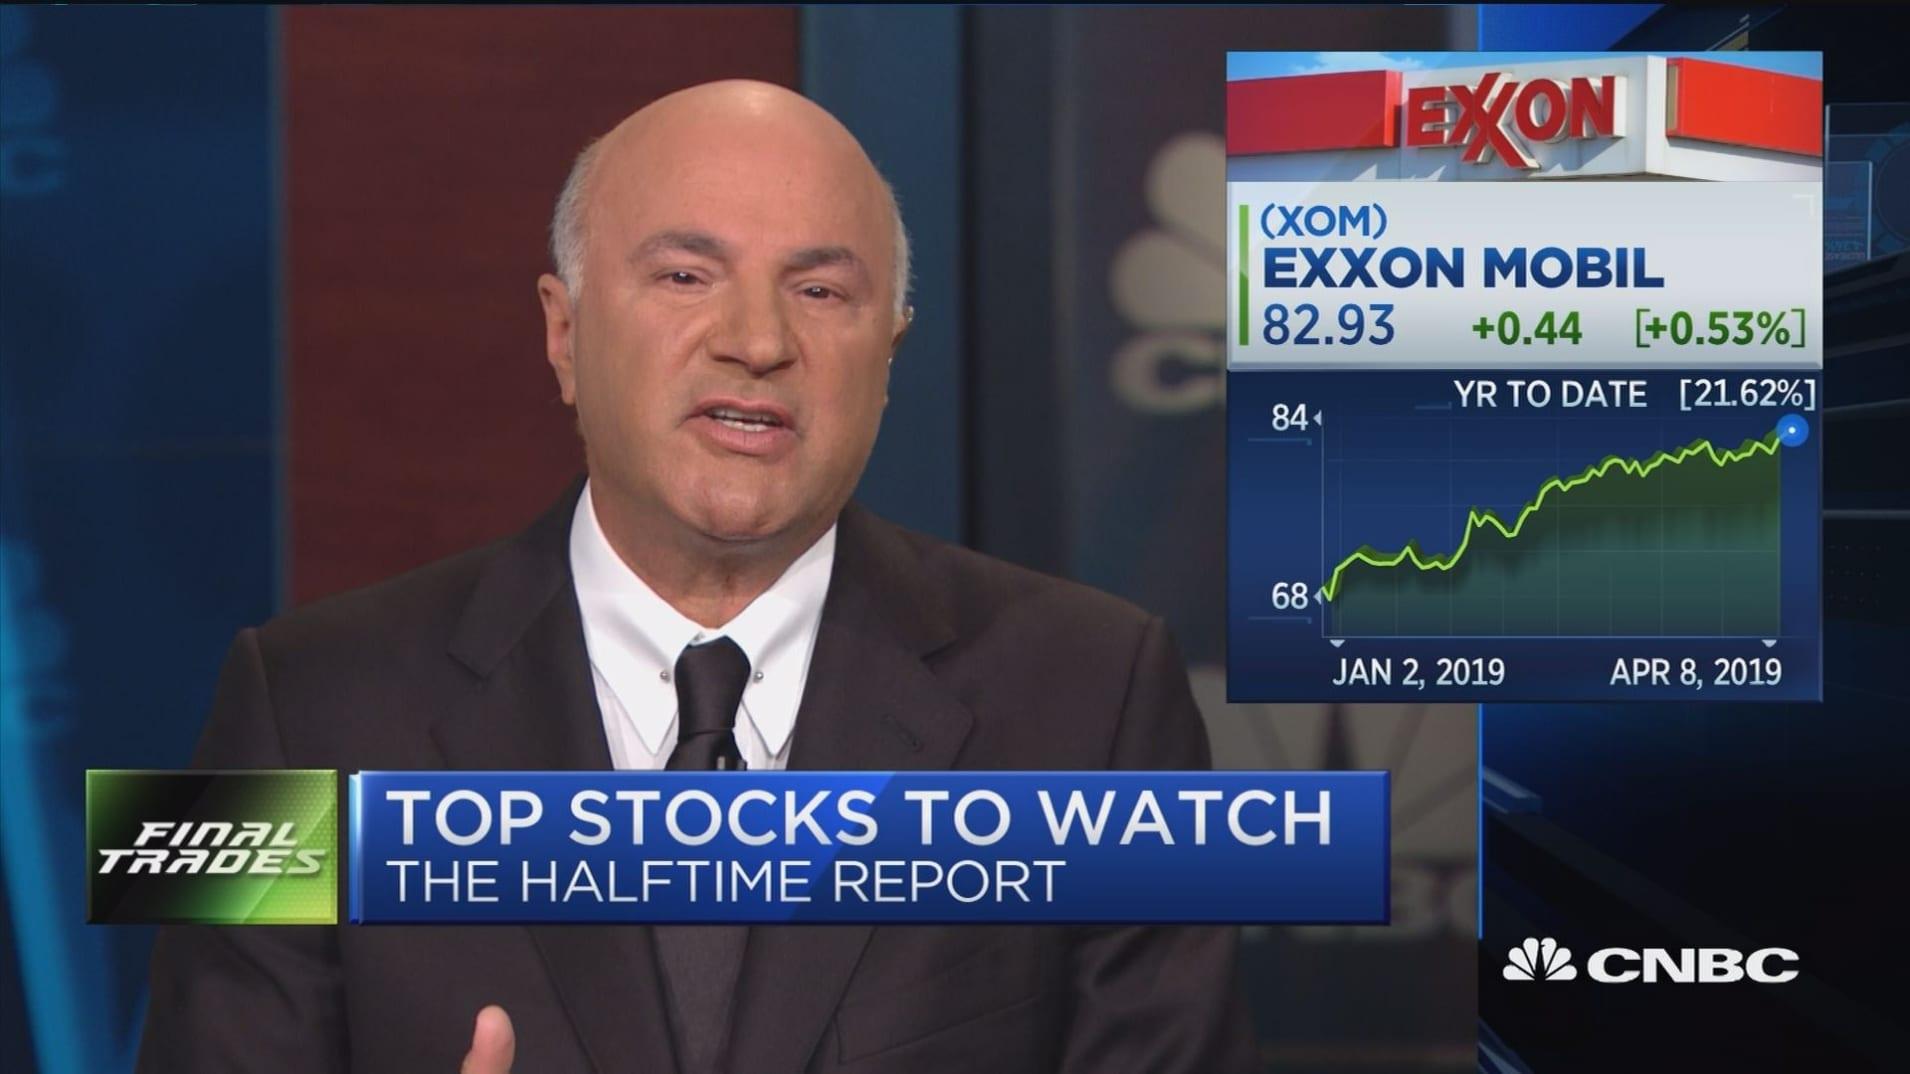 Final trades: Exxon Mobil, Navient, Starbucks, biotech & the banks